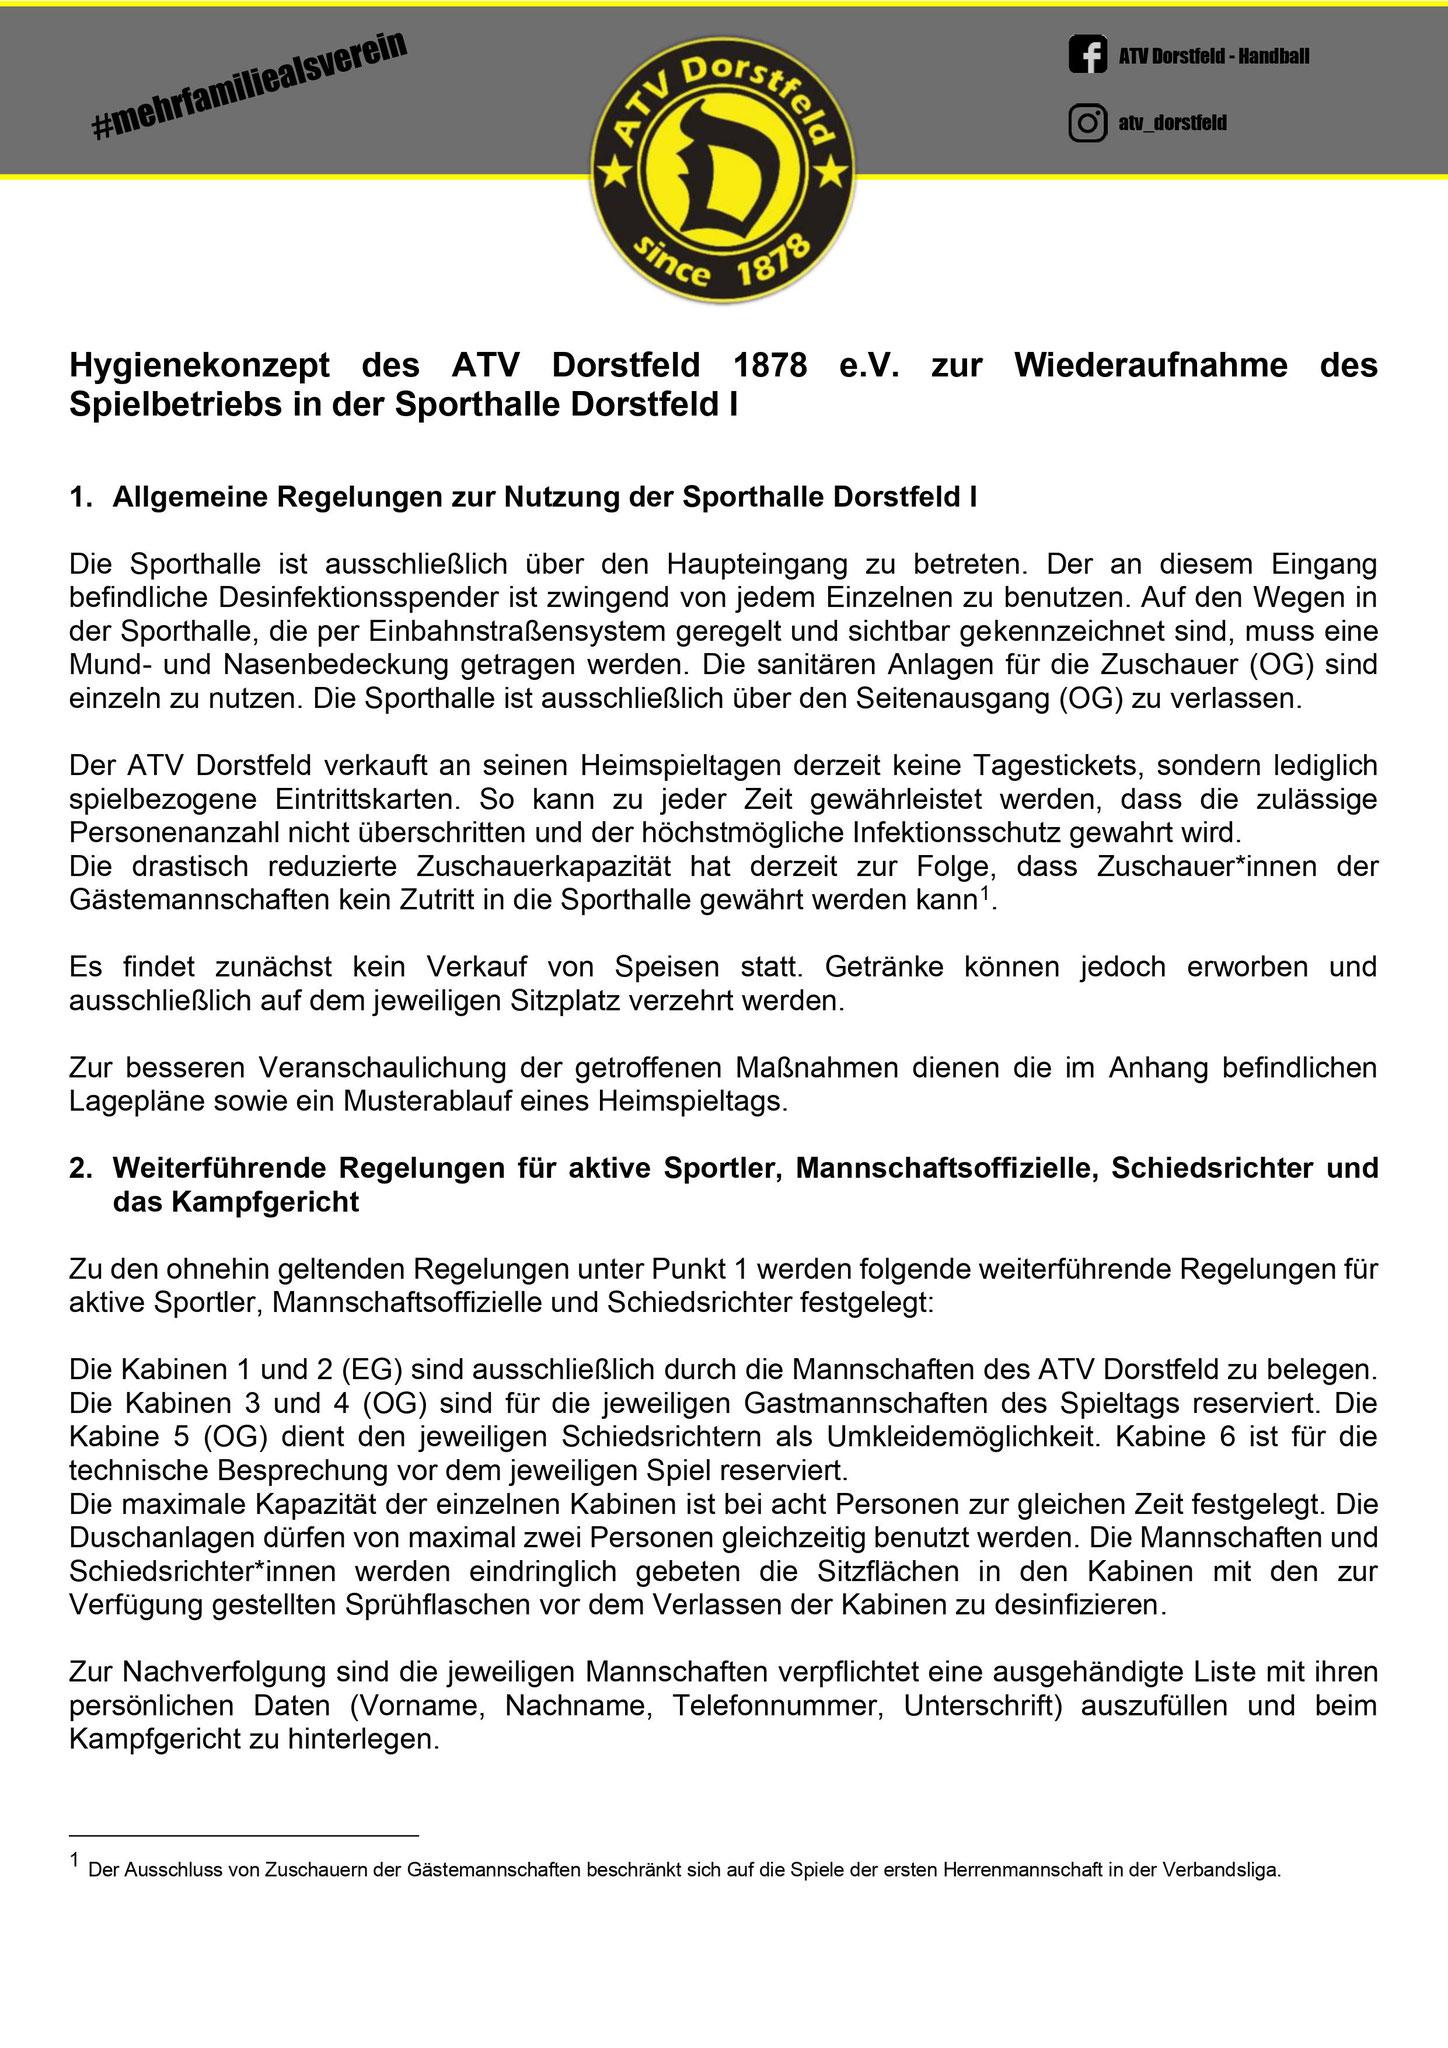 Seite 1 - Hygienekonzept des ATV Dorstfeld